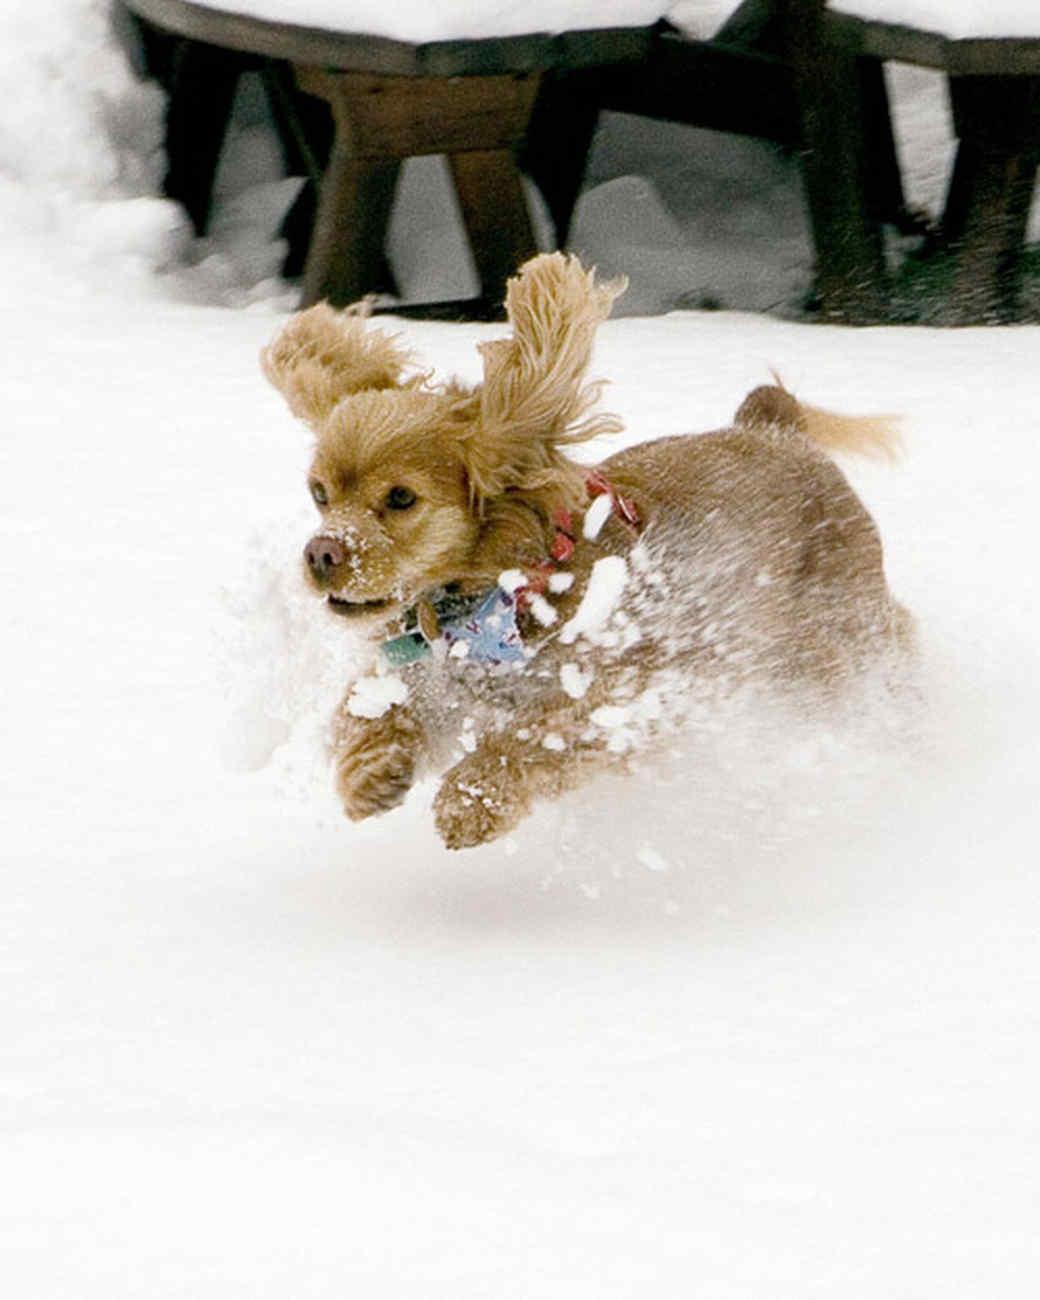 pets_snowangels_7319485_122717_19256160.jpg